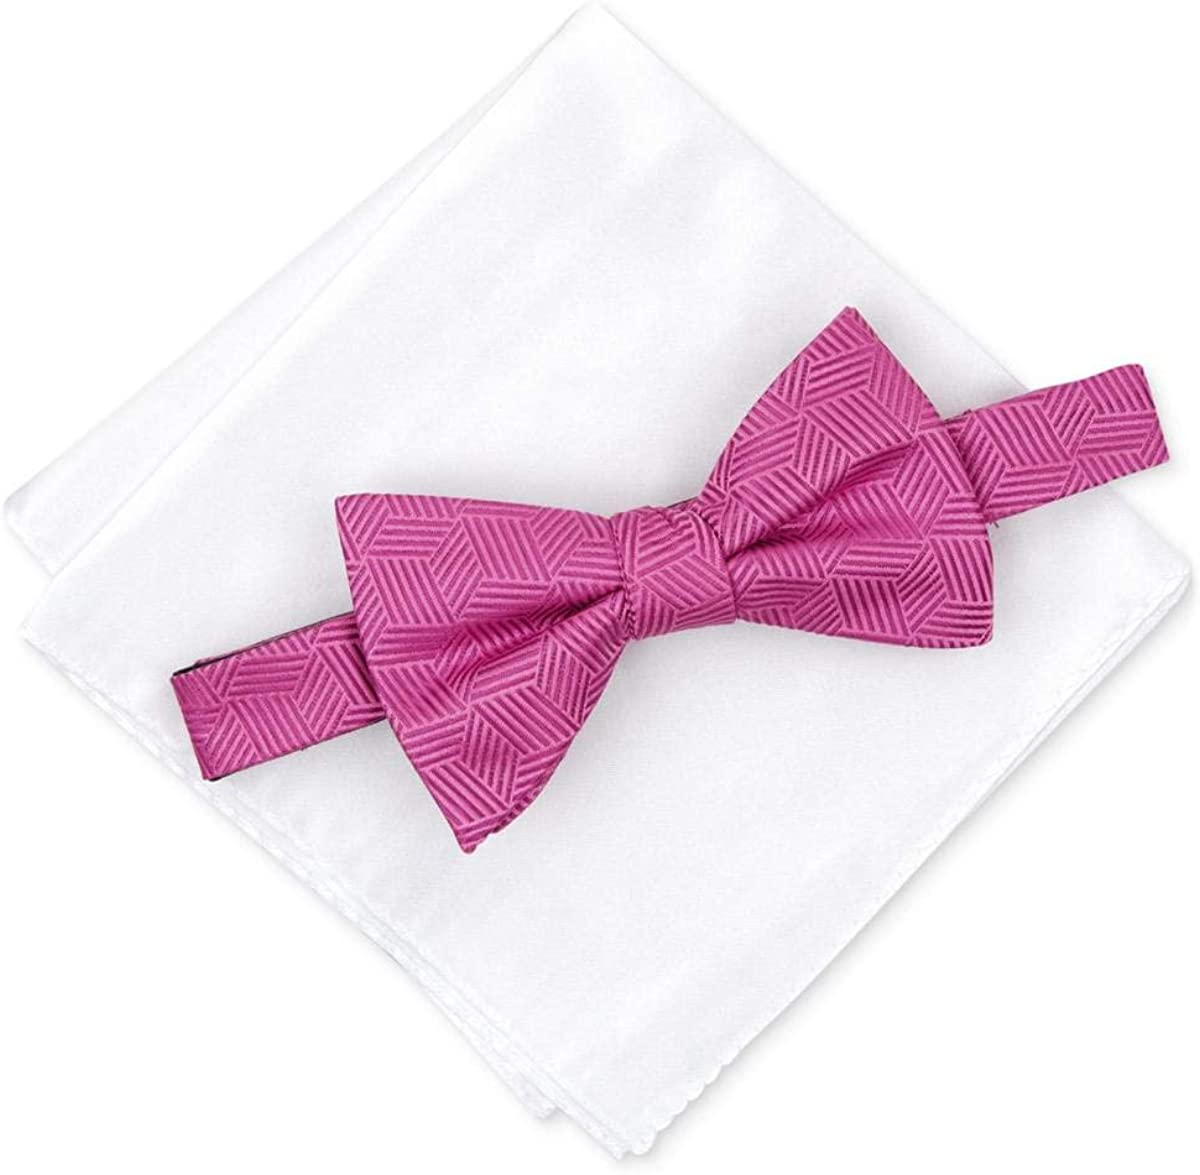 Alfani Mens Shubert Satin Pocket Square Bow Tie